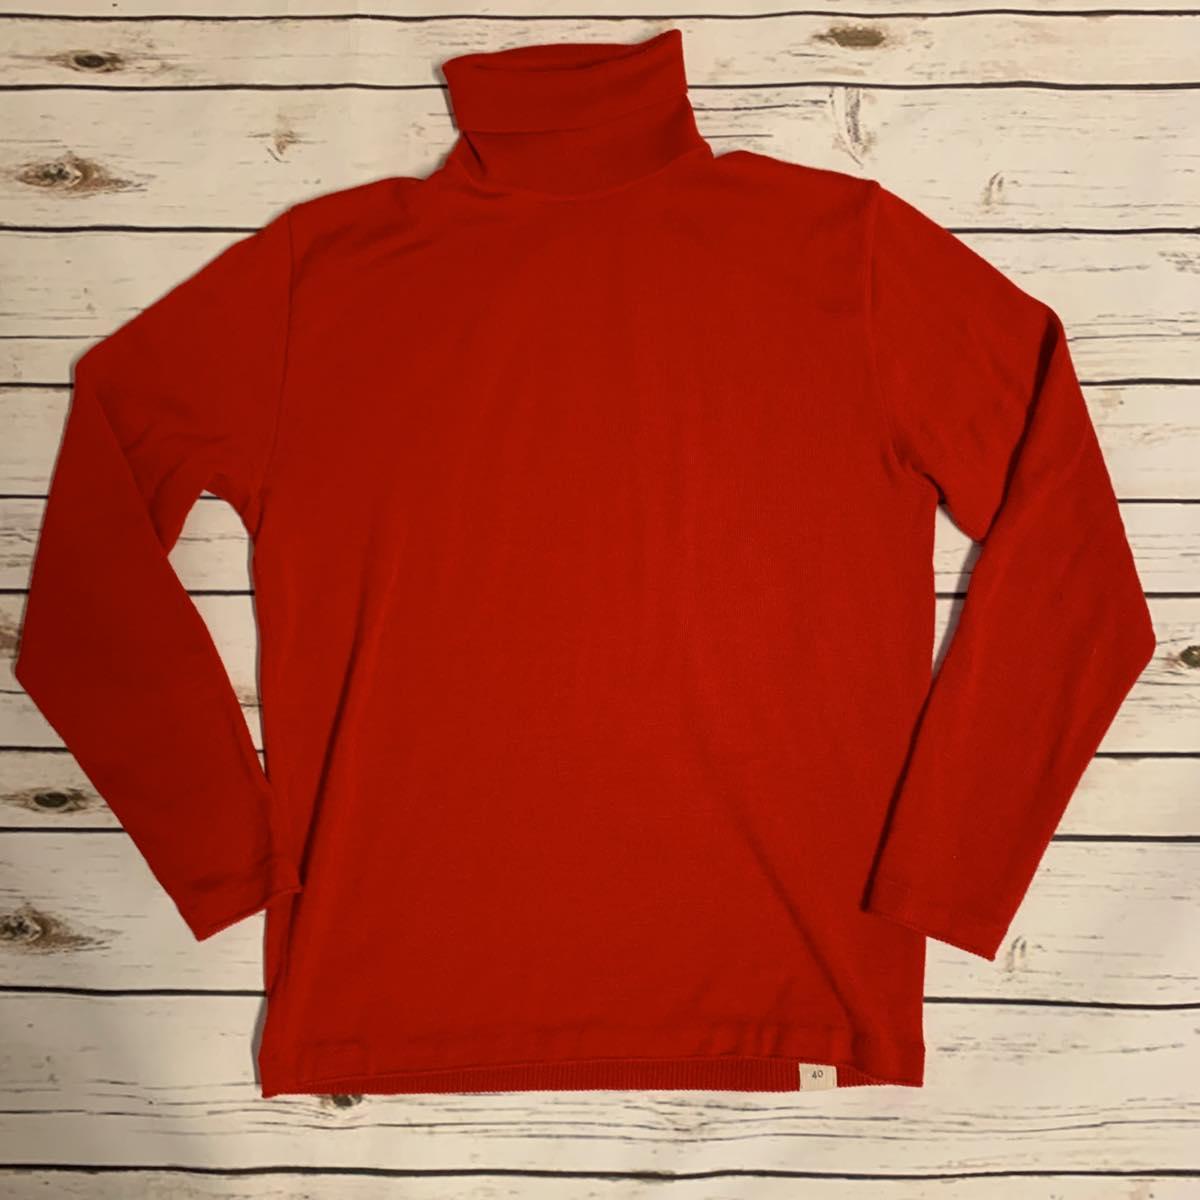 BONCOURA (ボンクラ)タートルネックセーター レッド turtle neck sweater red 2019FW